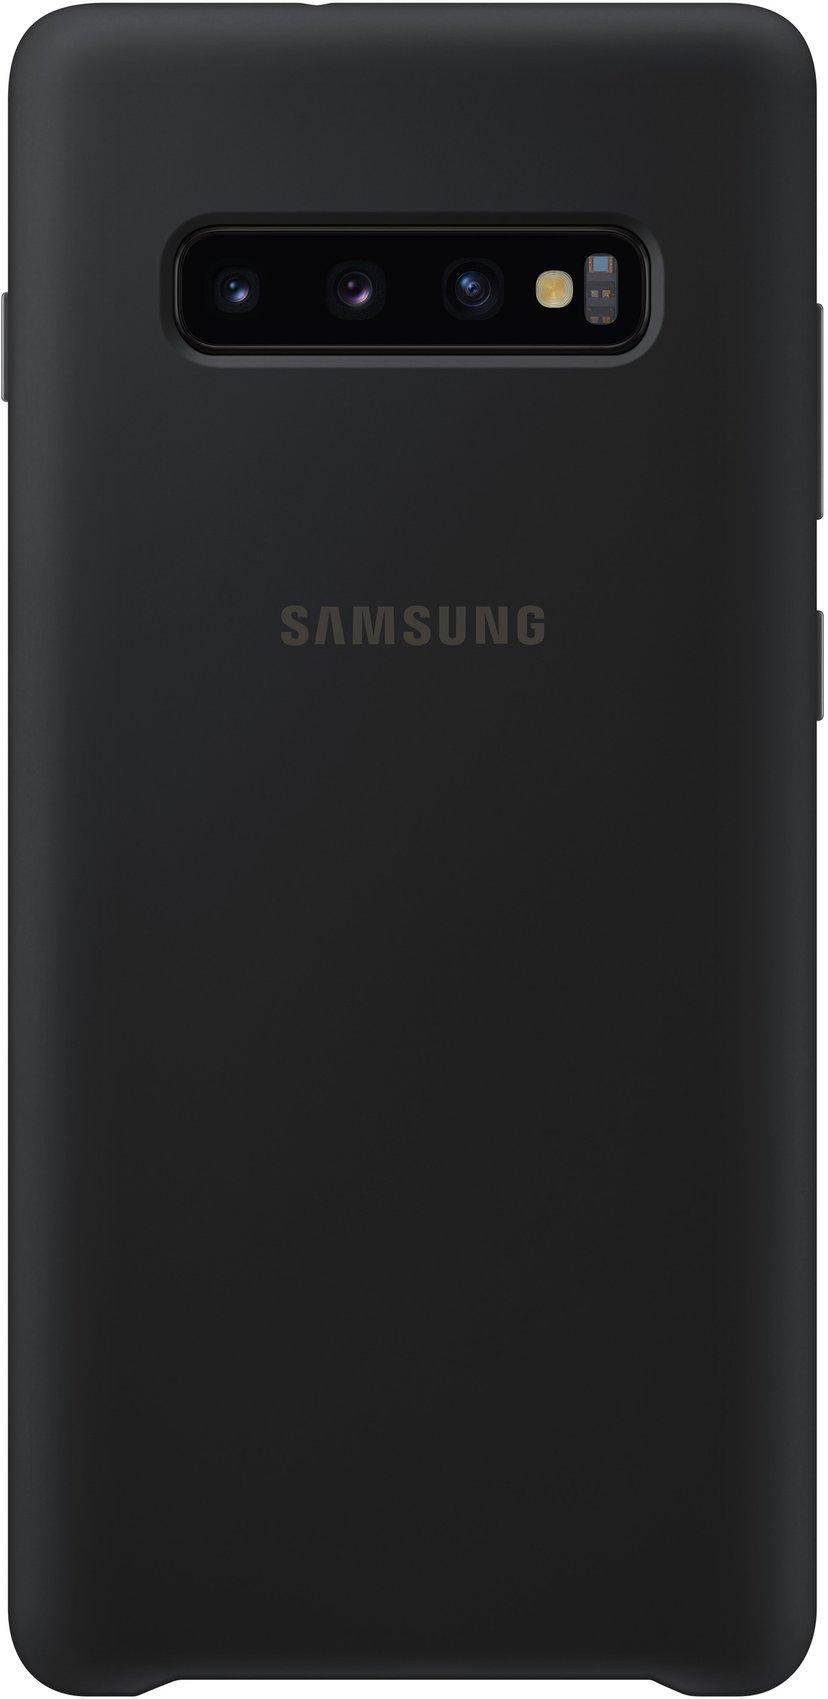 Samsung Silicone Cover EF-PG975 Samsung Galaxy S10+ Zwart